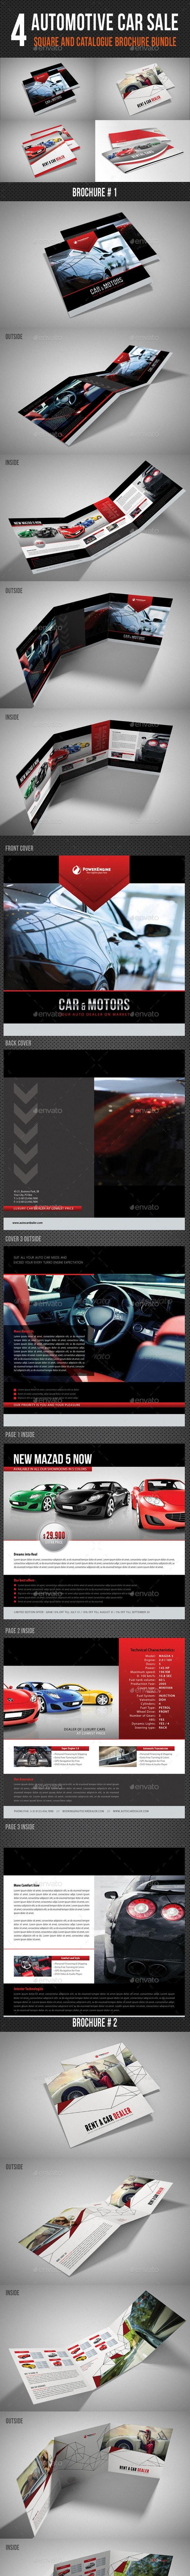 4 Automotive Car Sale Rental Brochure Bundle V02 - Corporate Brochures